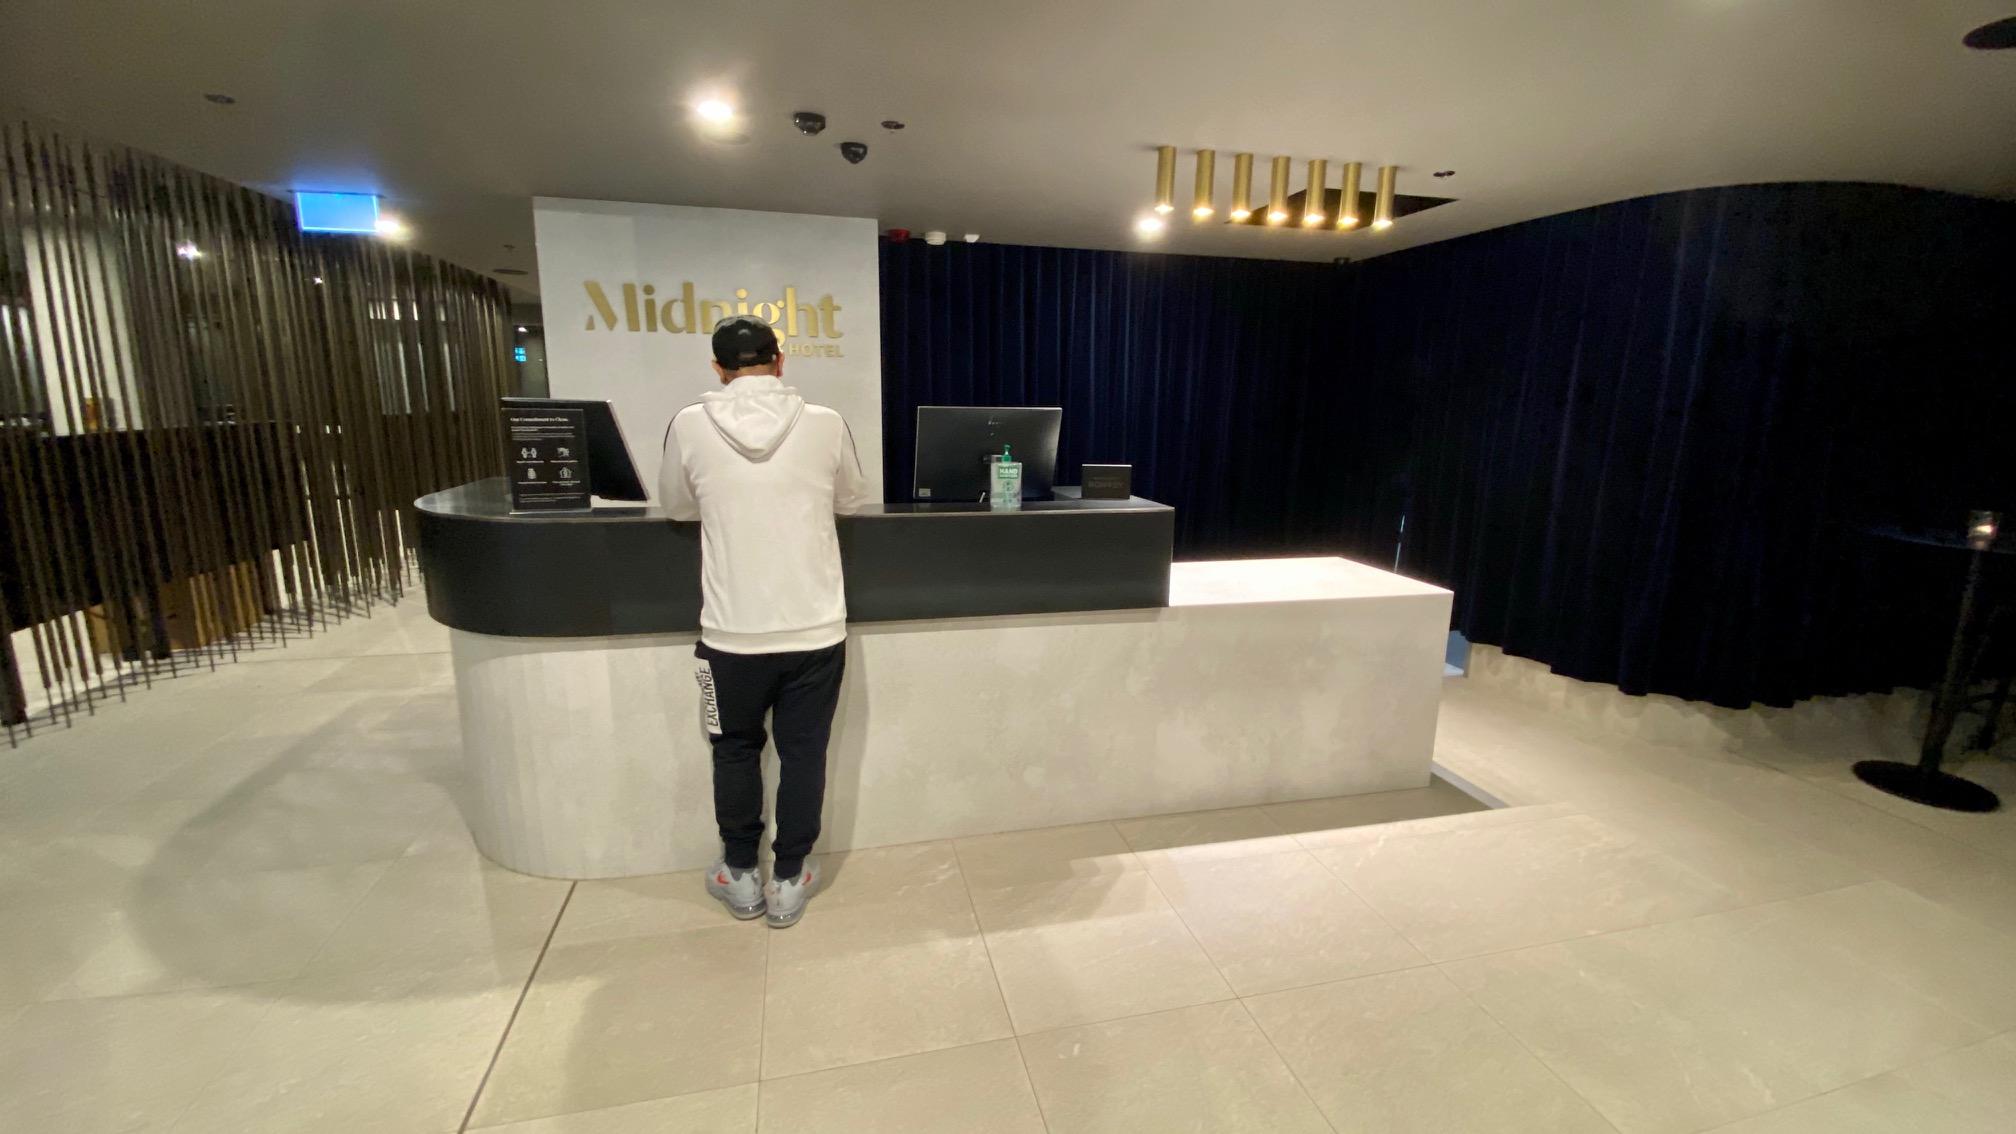 Reception, Midnight Hotel Canberra